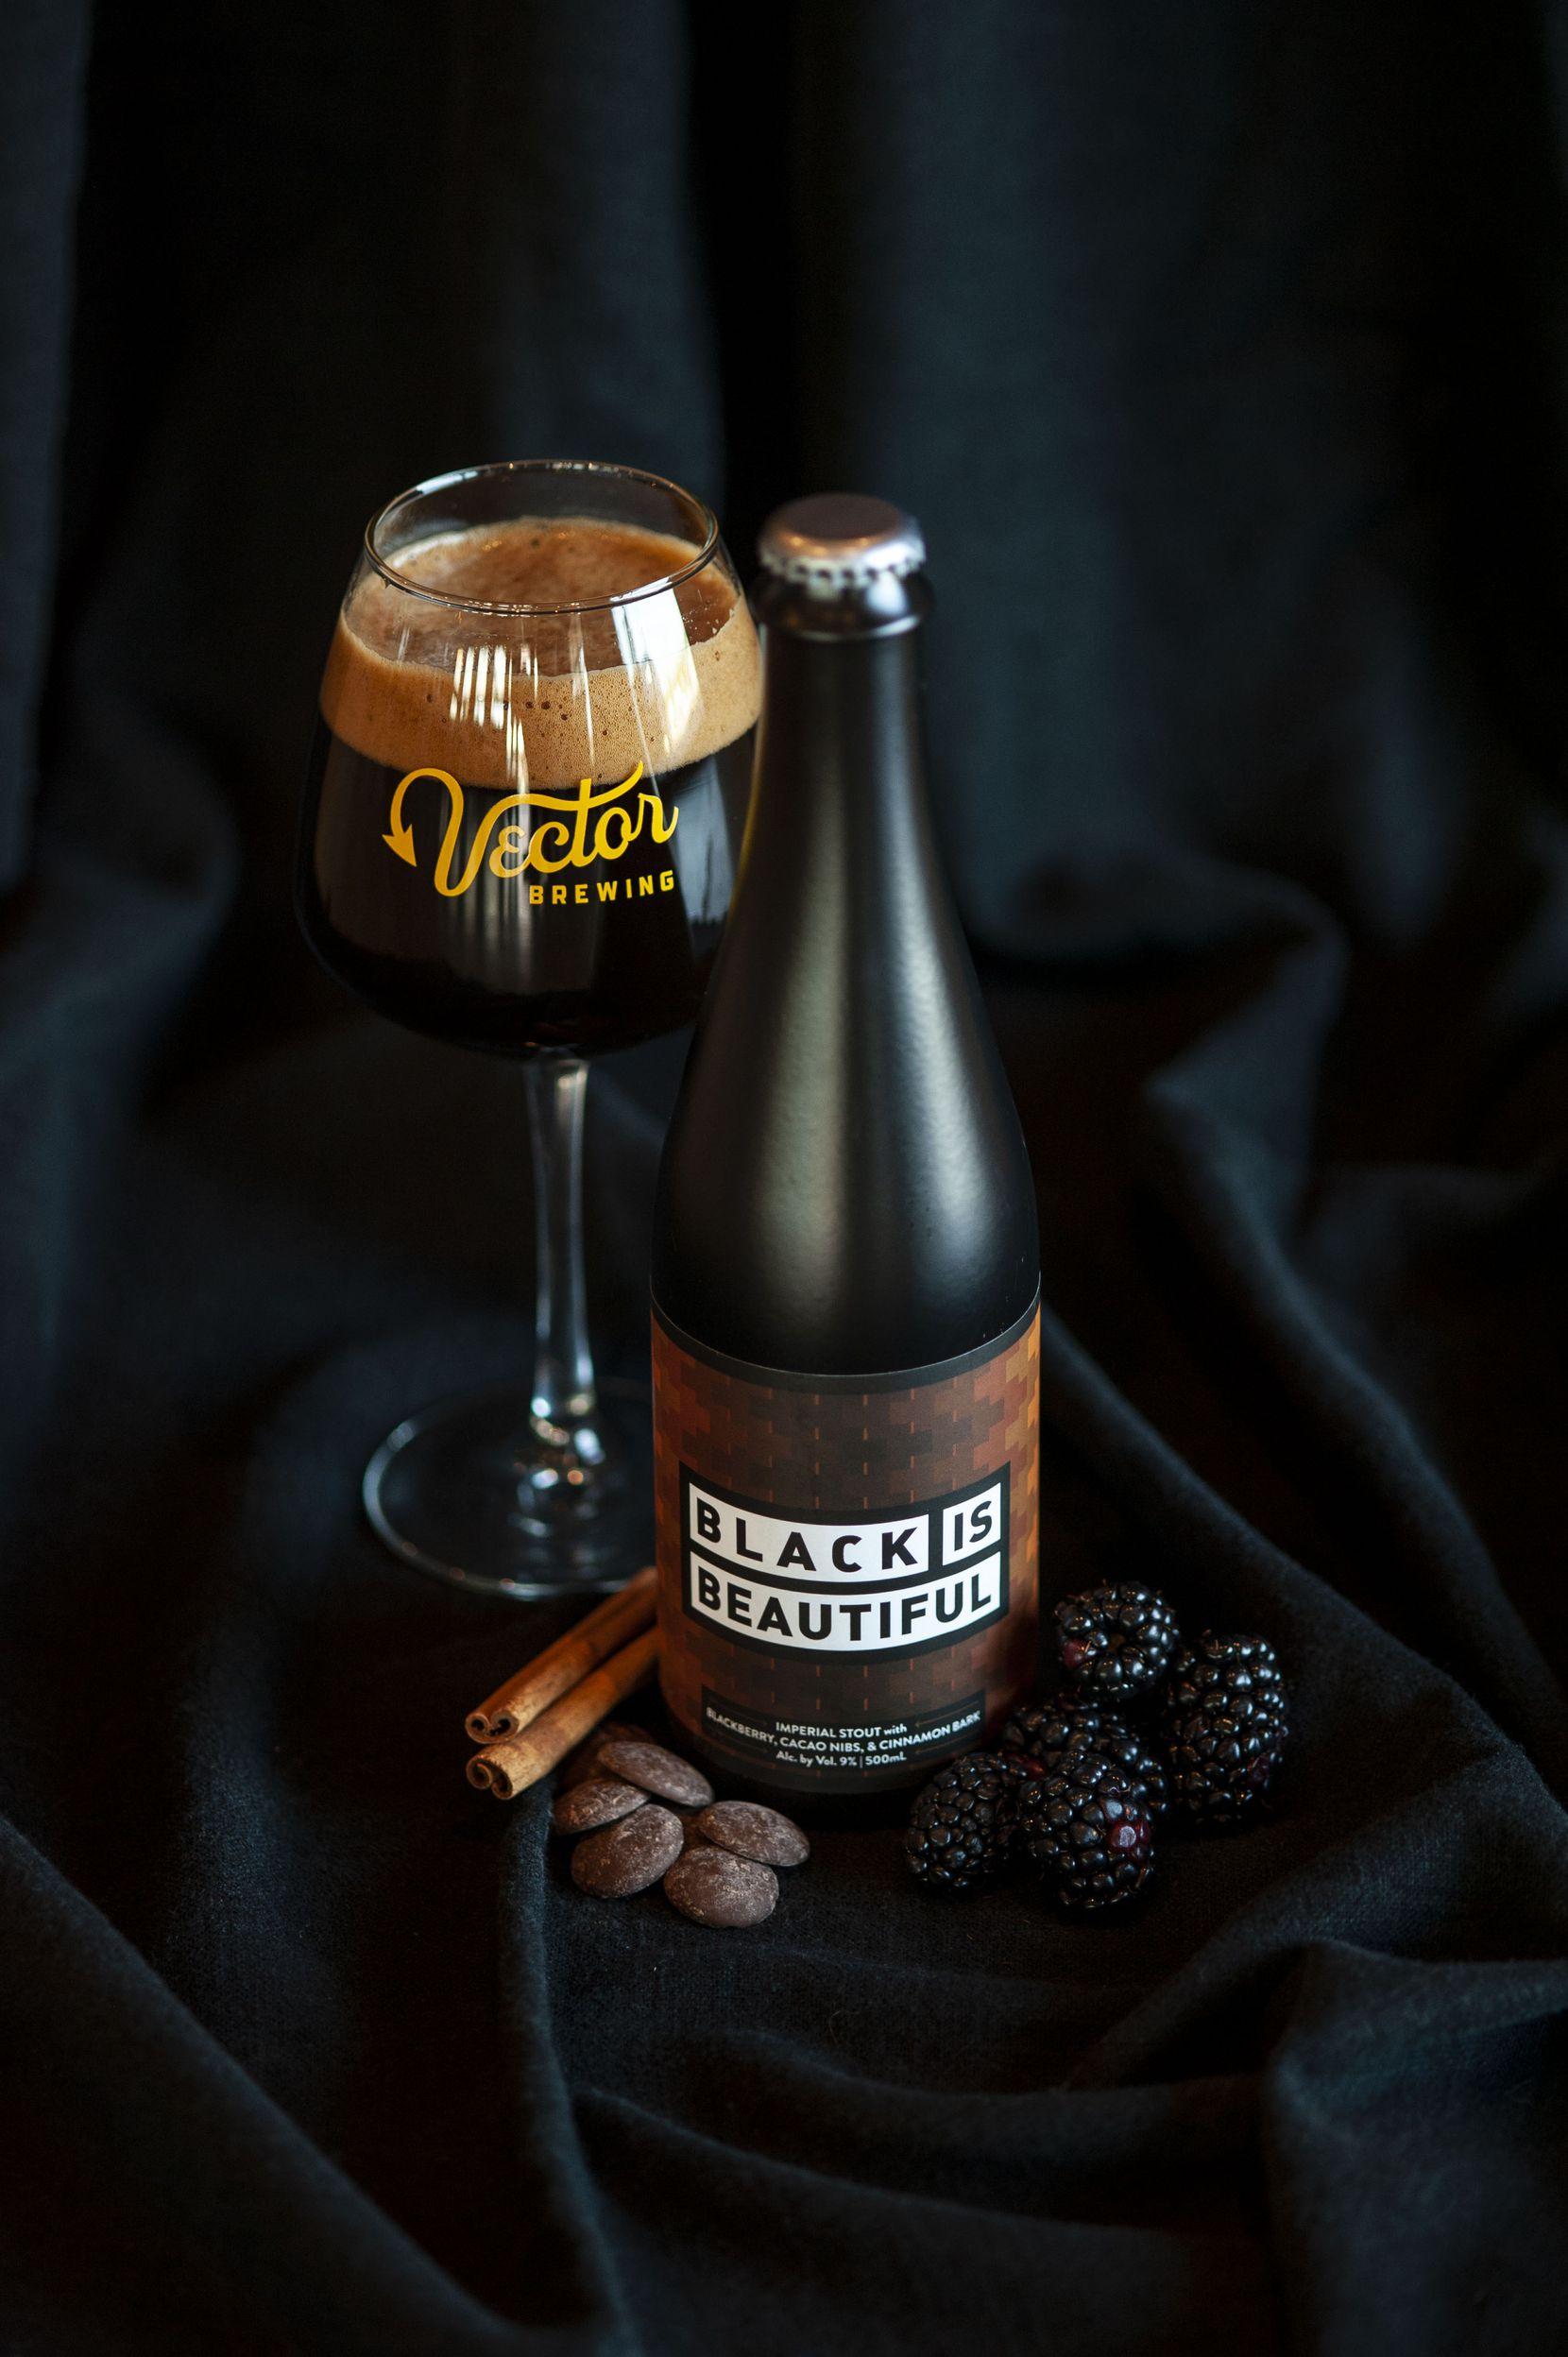 Black is Beautiful beer at Vector Brewing